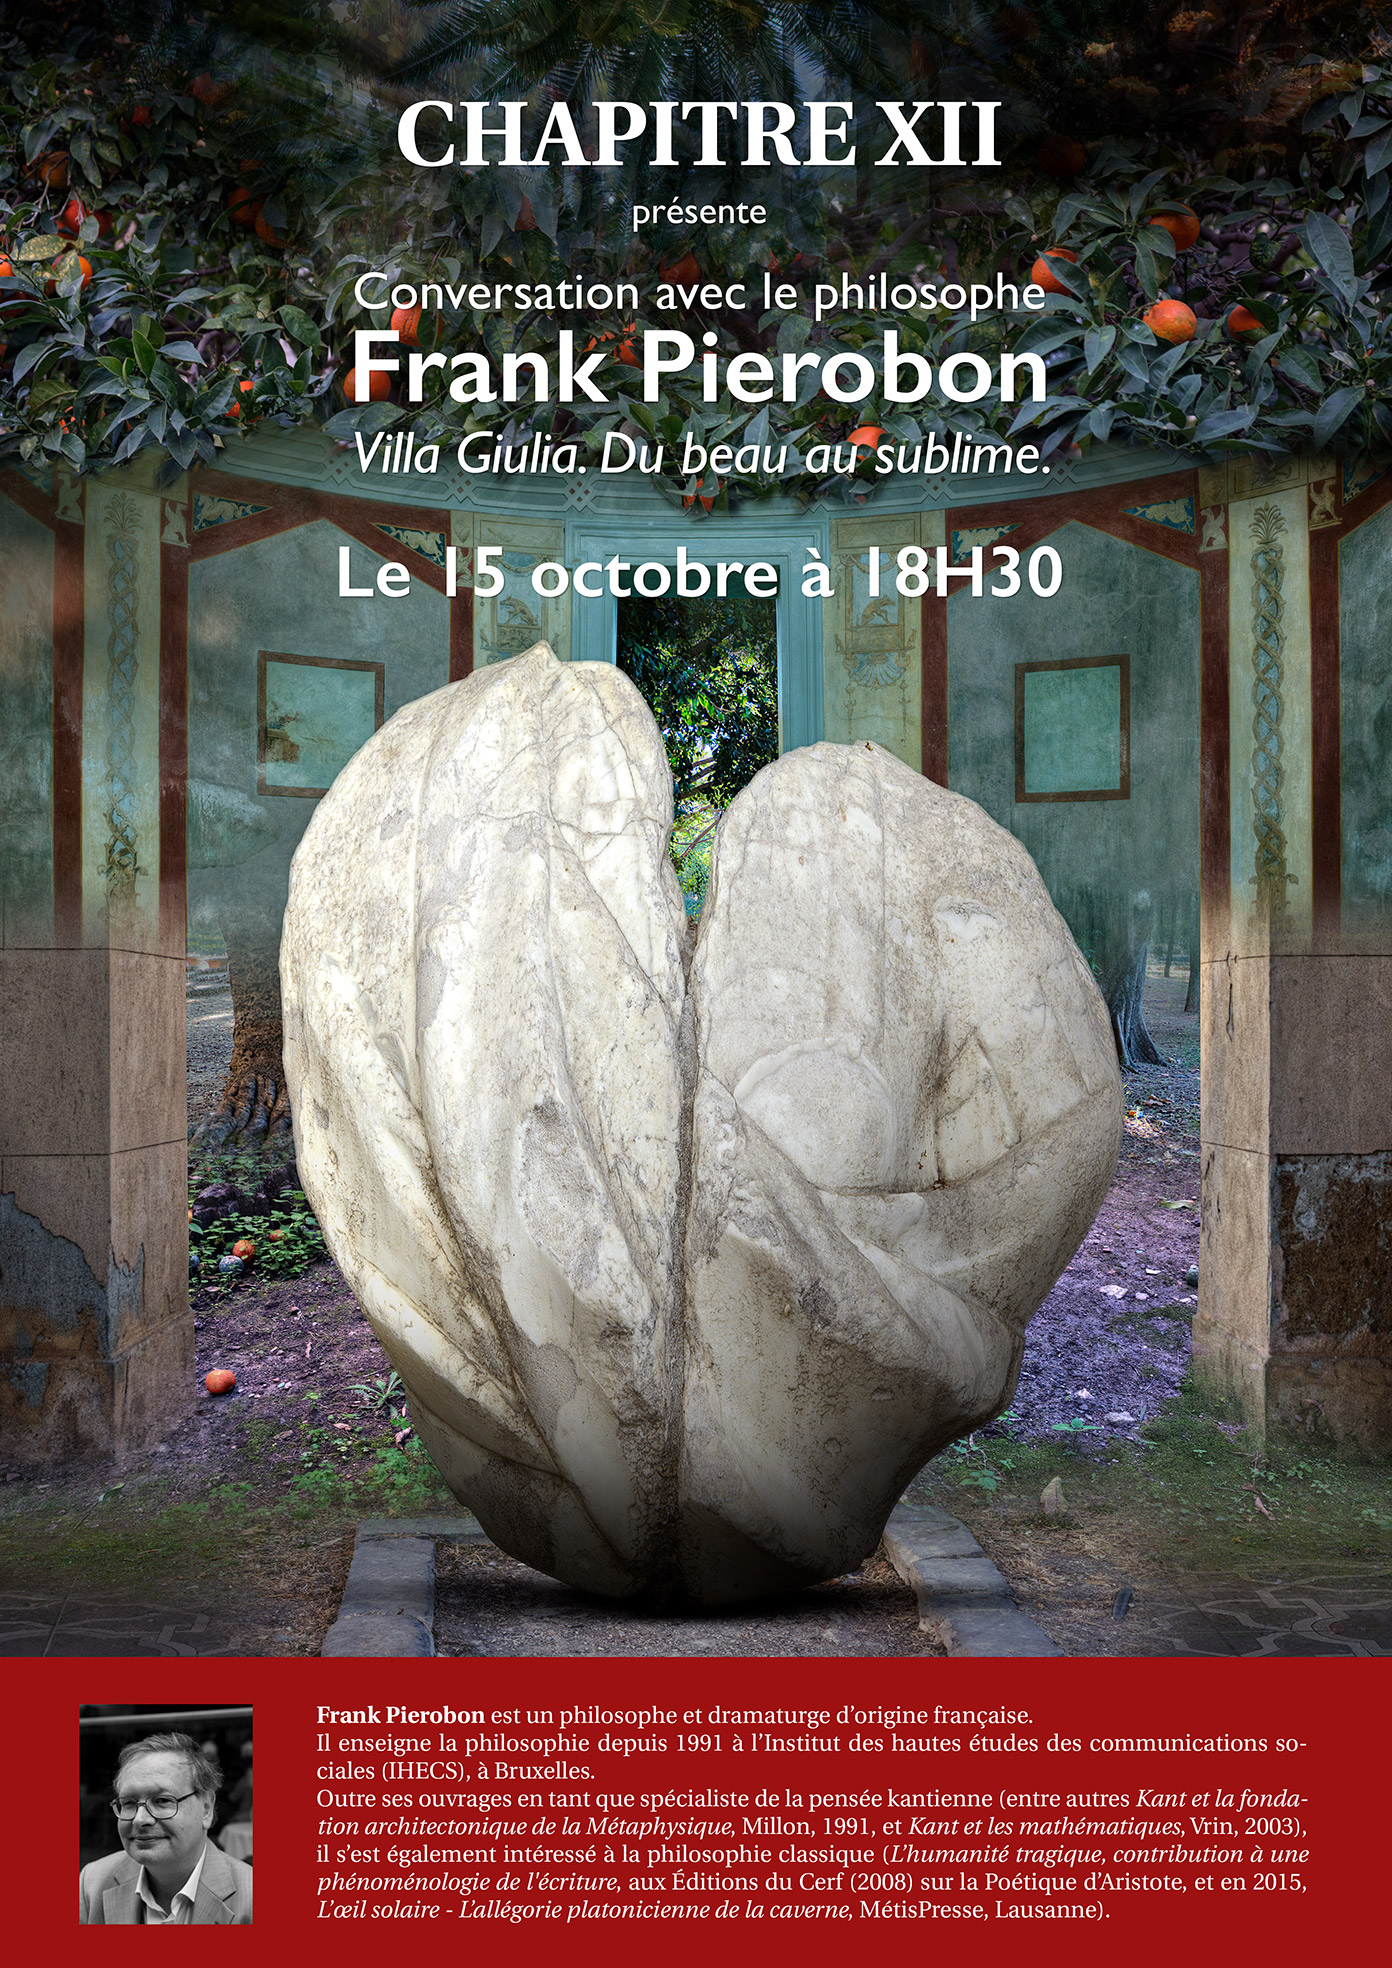 Frank Pierobon co CHAPITRE XII